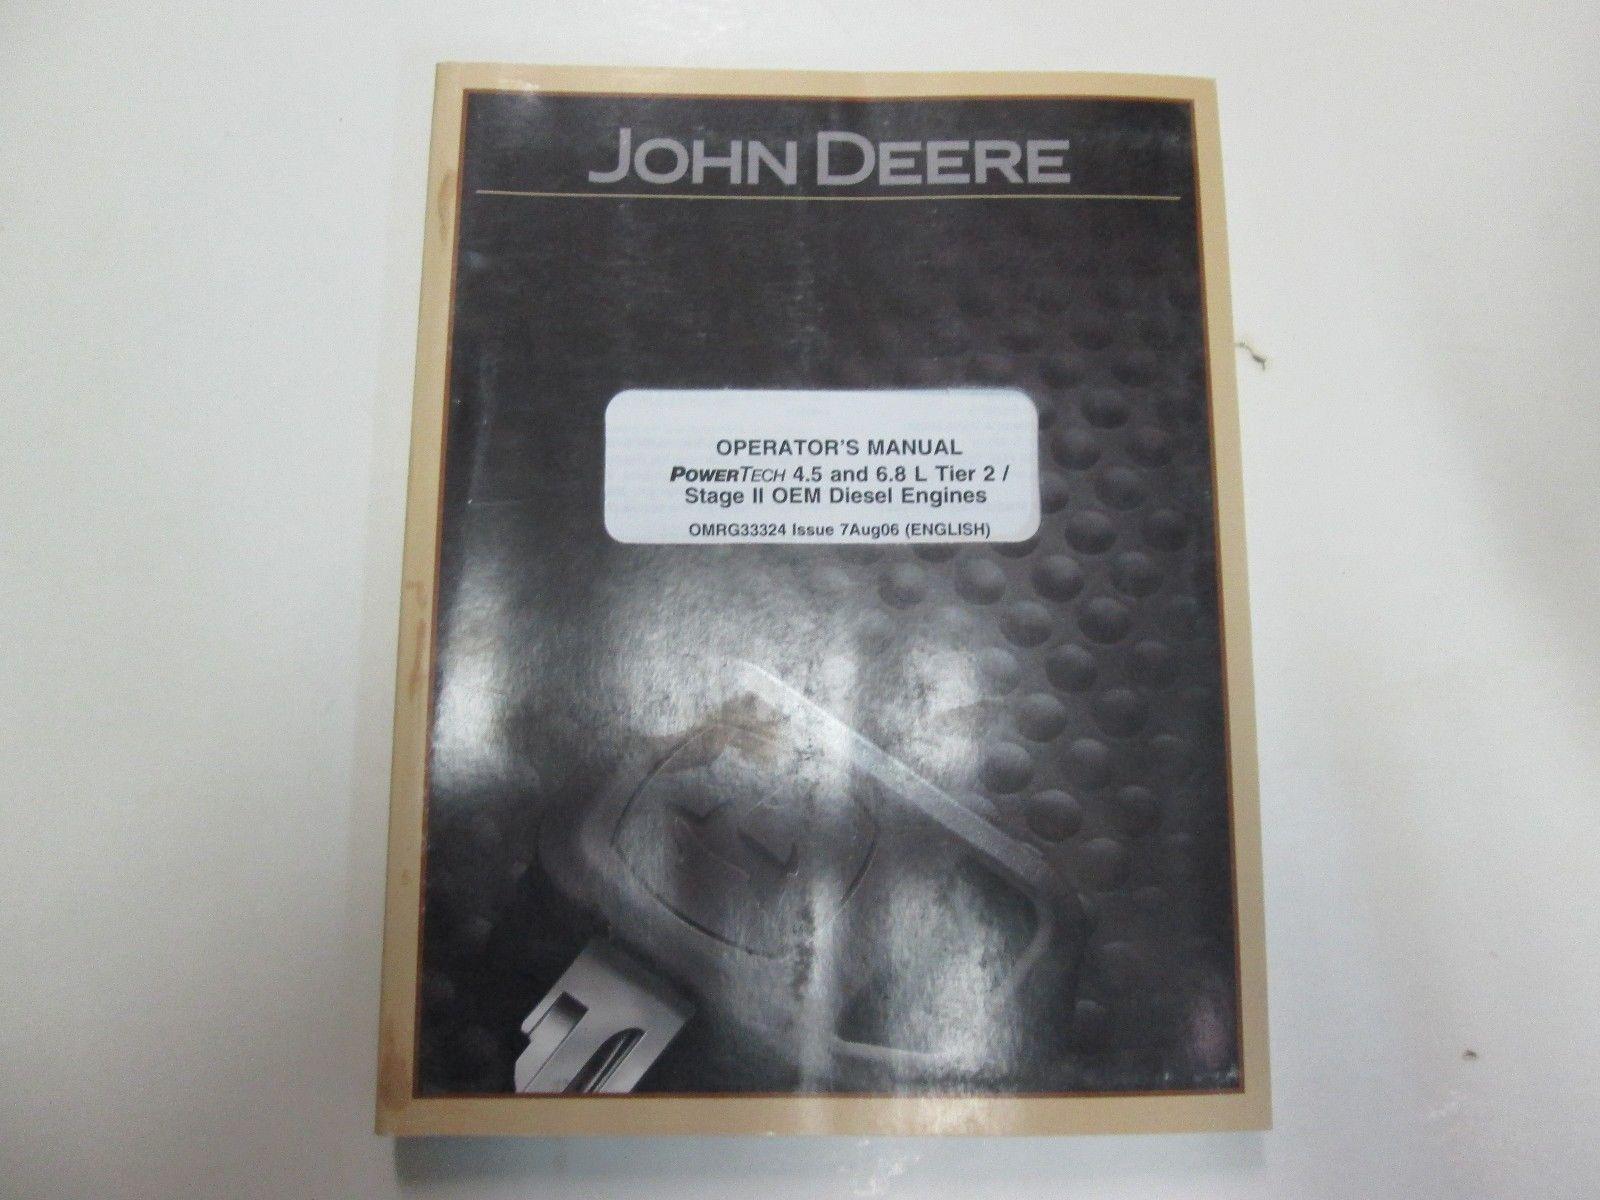 John Deere Powertech 4.5L 6.8L Tier 2 Stage II Diesel Engines Operators  Manual